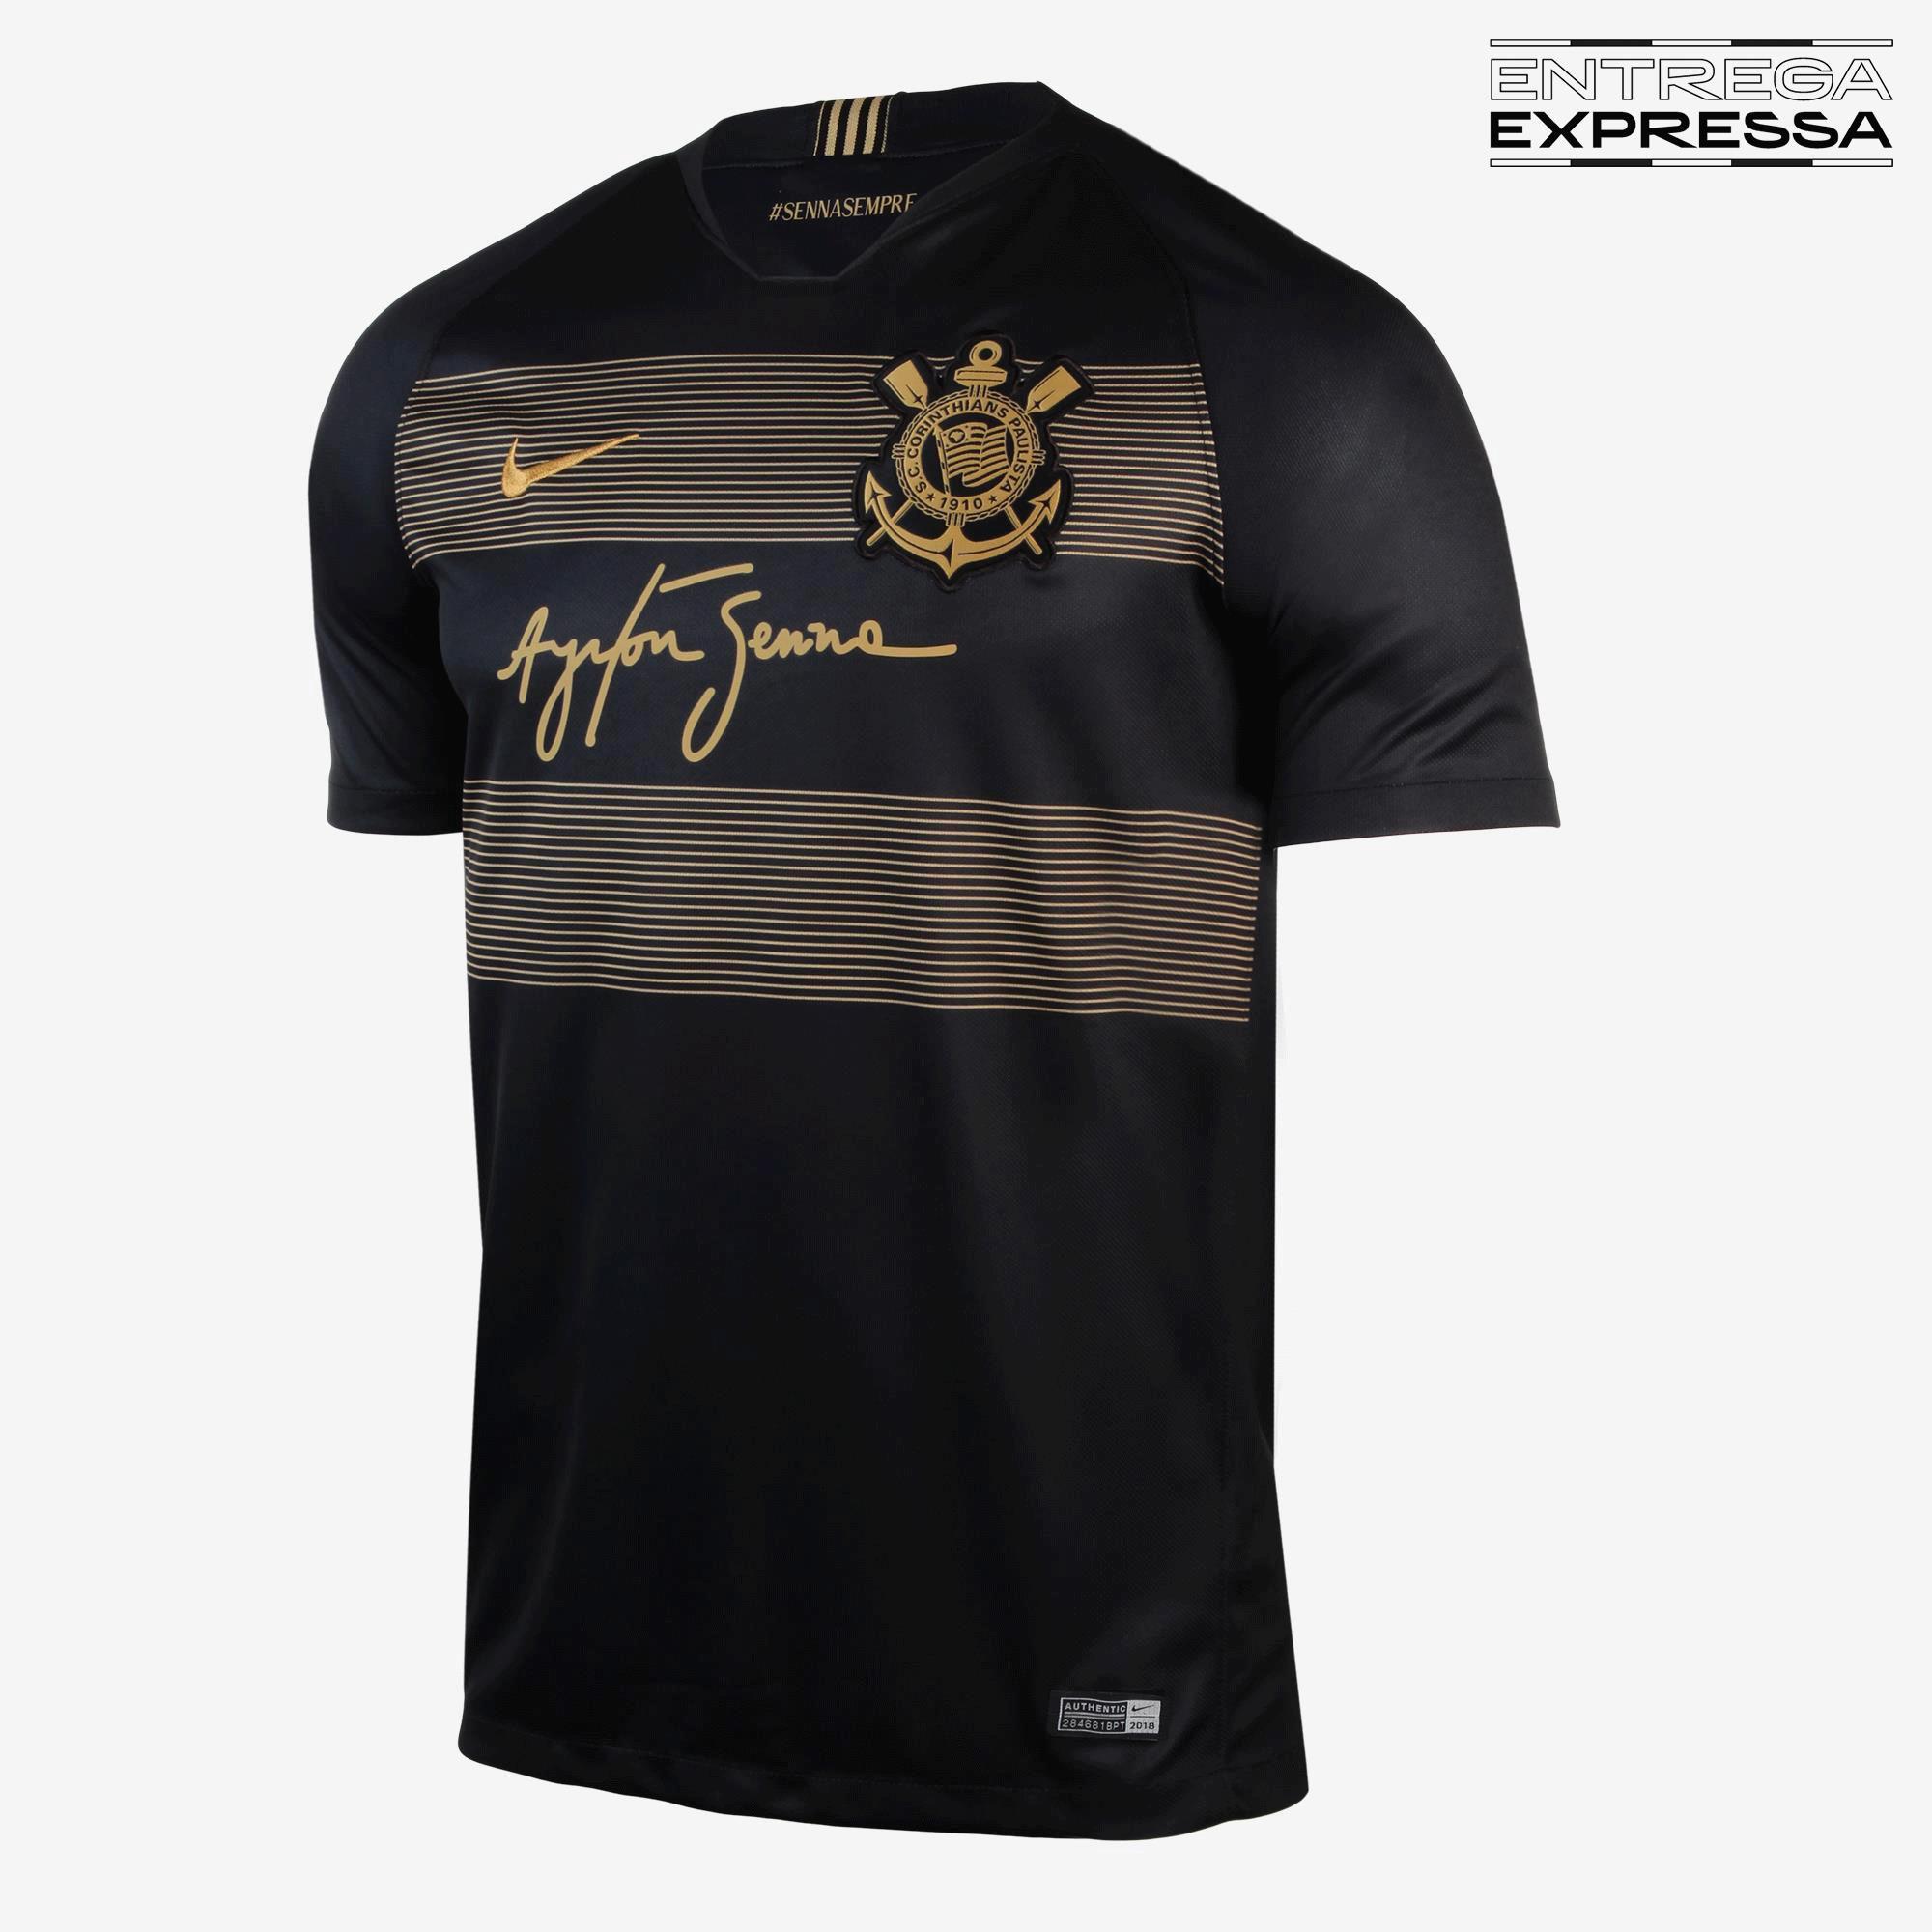 Camisa Nike Torcedor Corinthians III Preto - 2018 19 - Titanes Esportes 6223c07a6500a